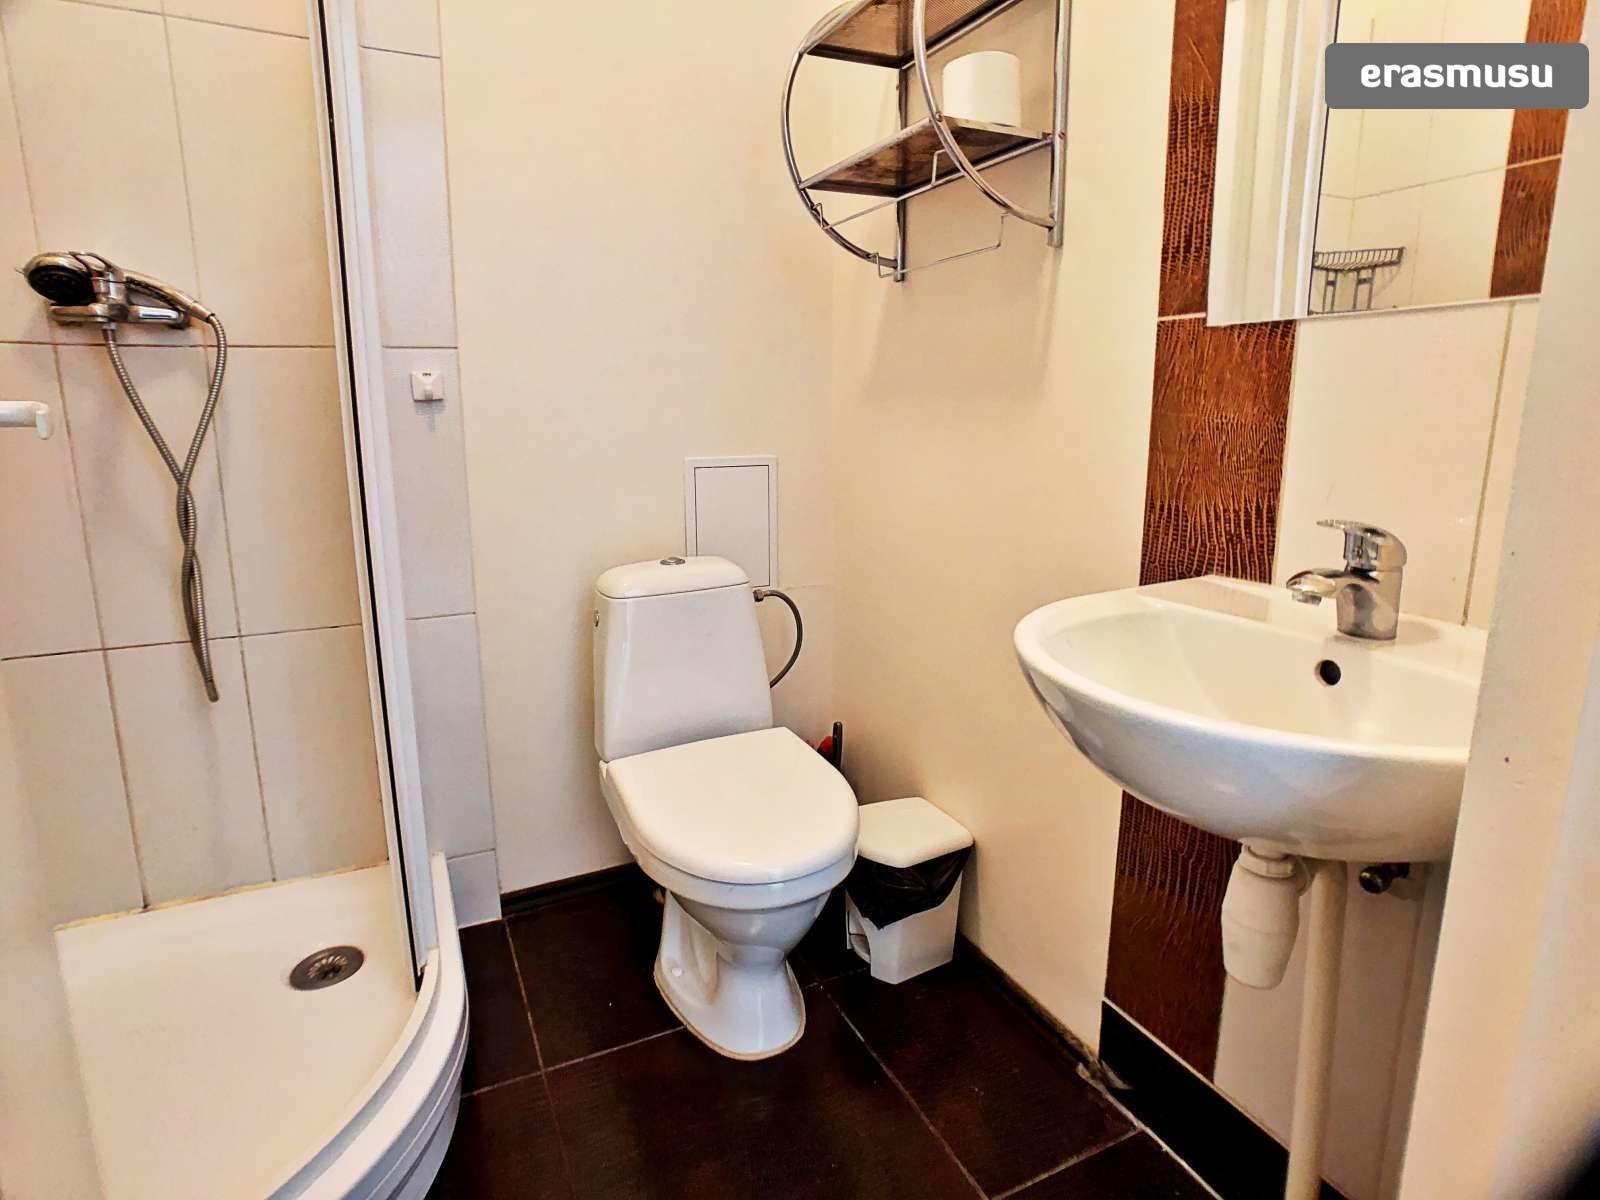 cheery-cute-studio-apartment-rent-dzirciems-1a9b2bee04ce0f0249d1